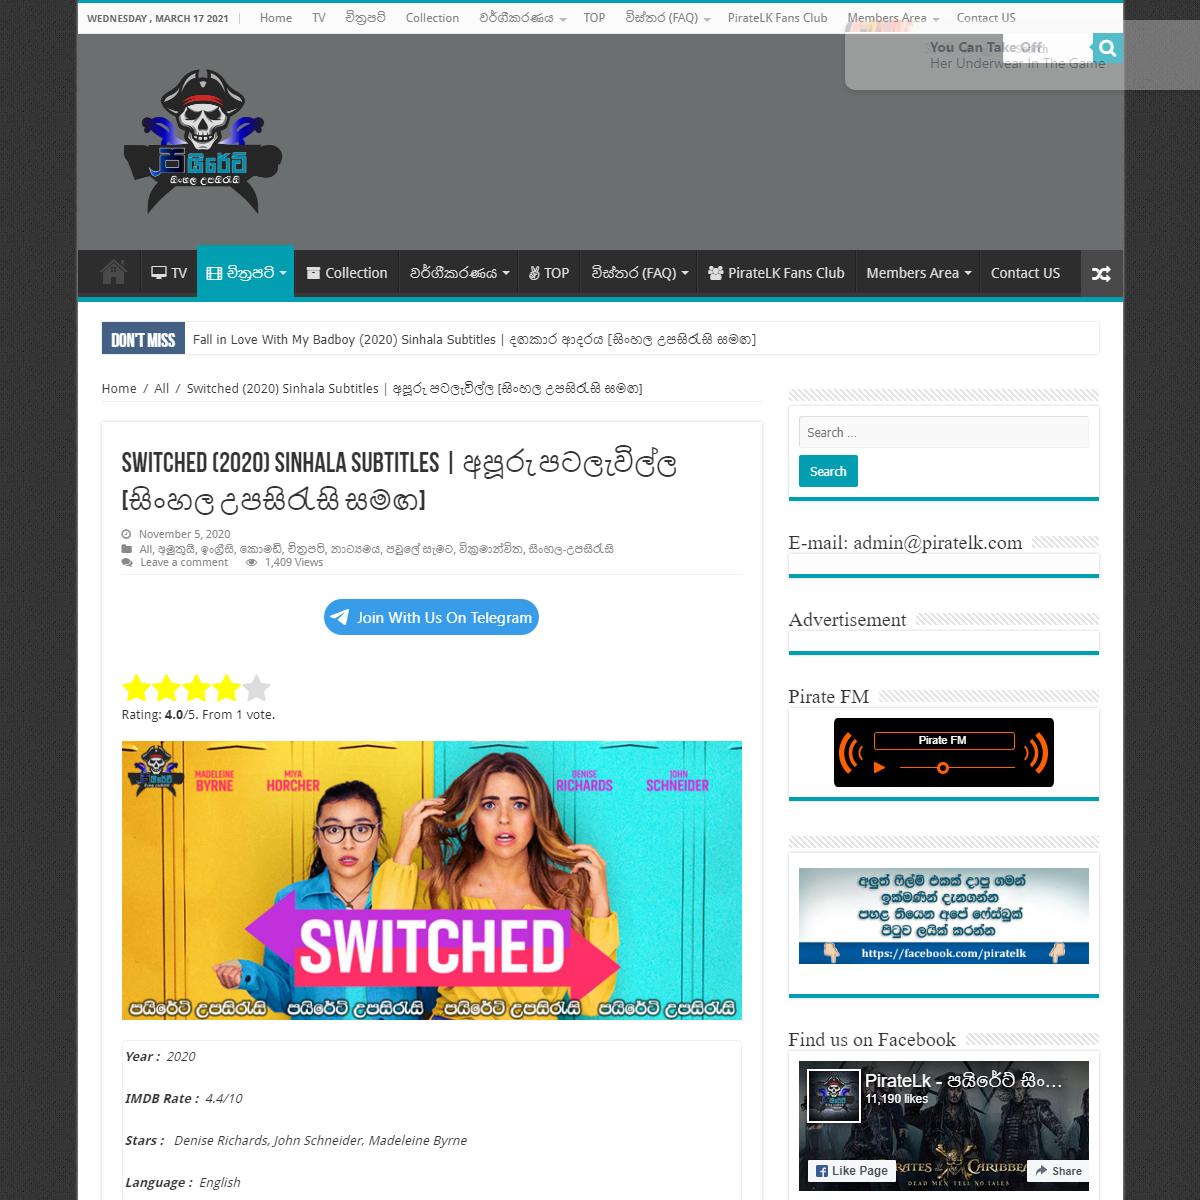 Switched (2020) Sinhala Subtitles - අපූරු පටලැවිල්ල [සිංහල උපසිරැසි සම